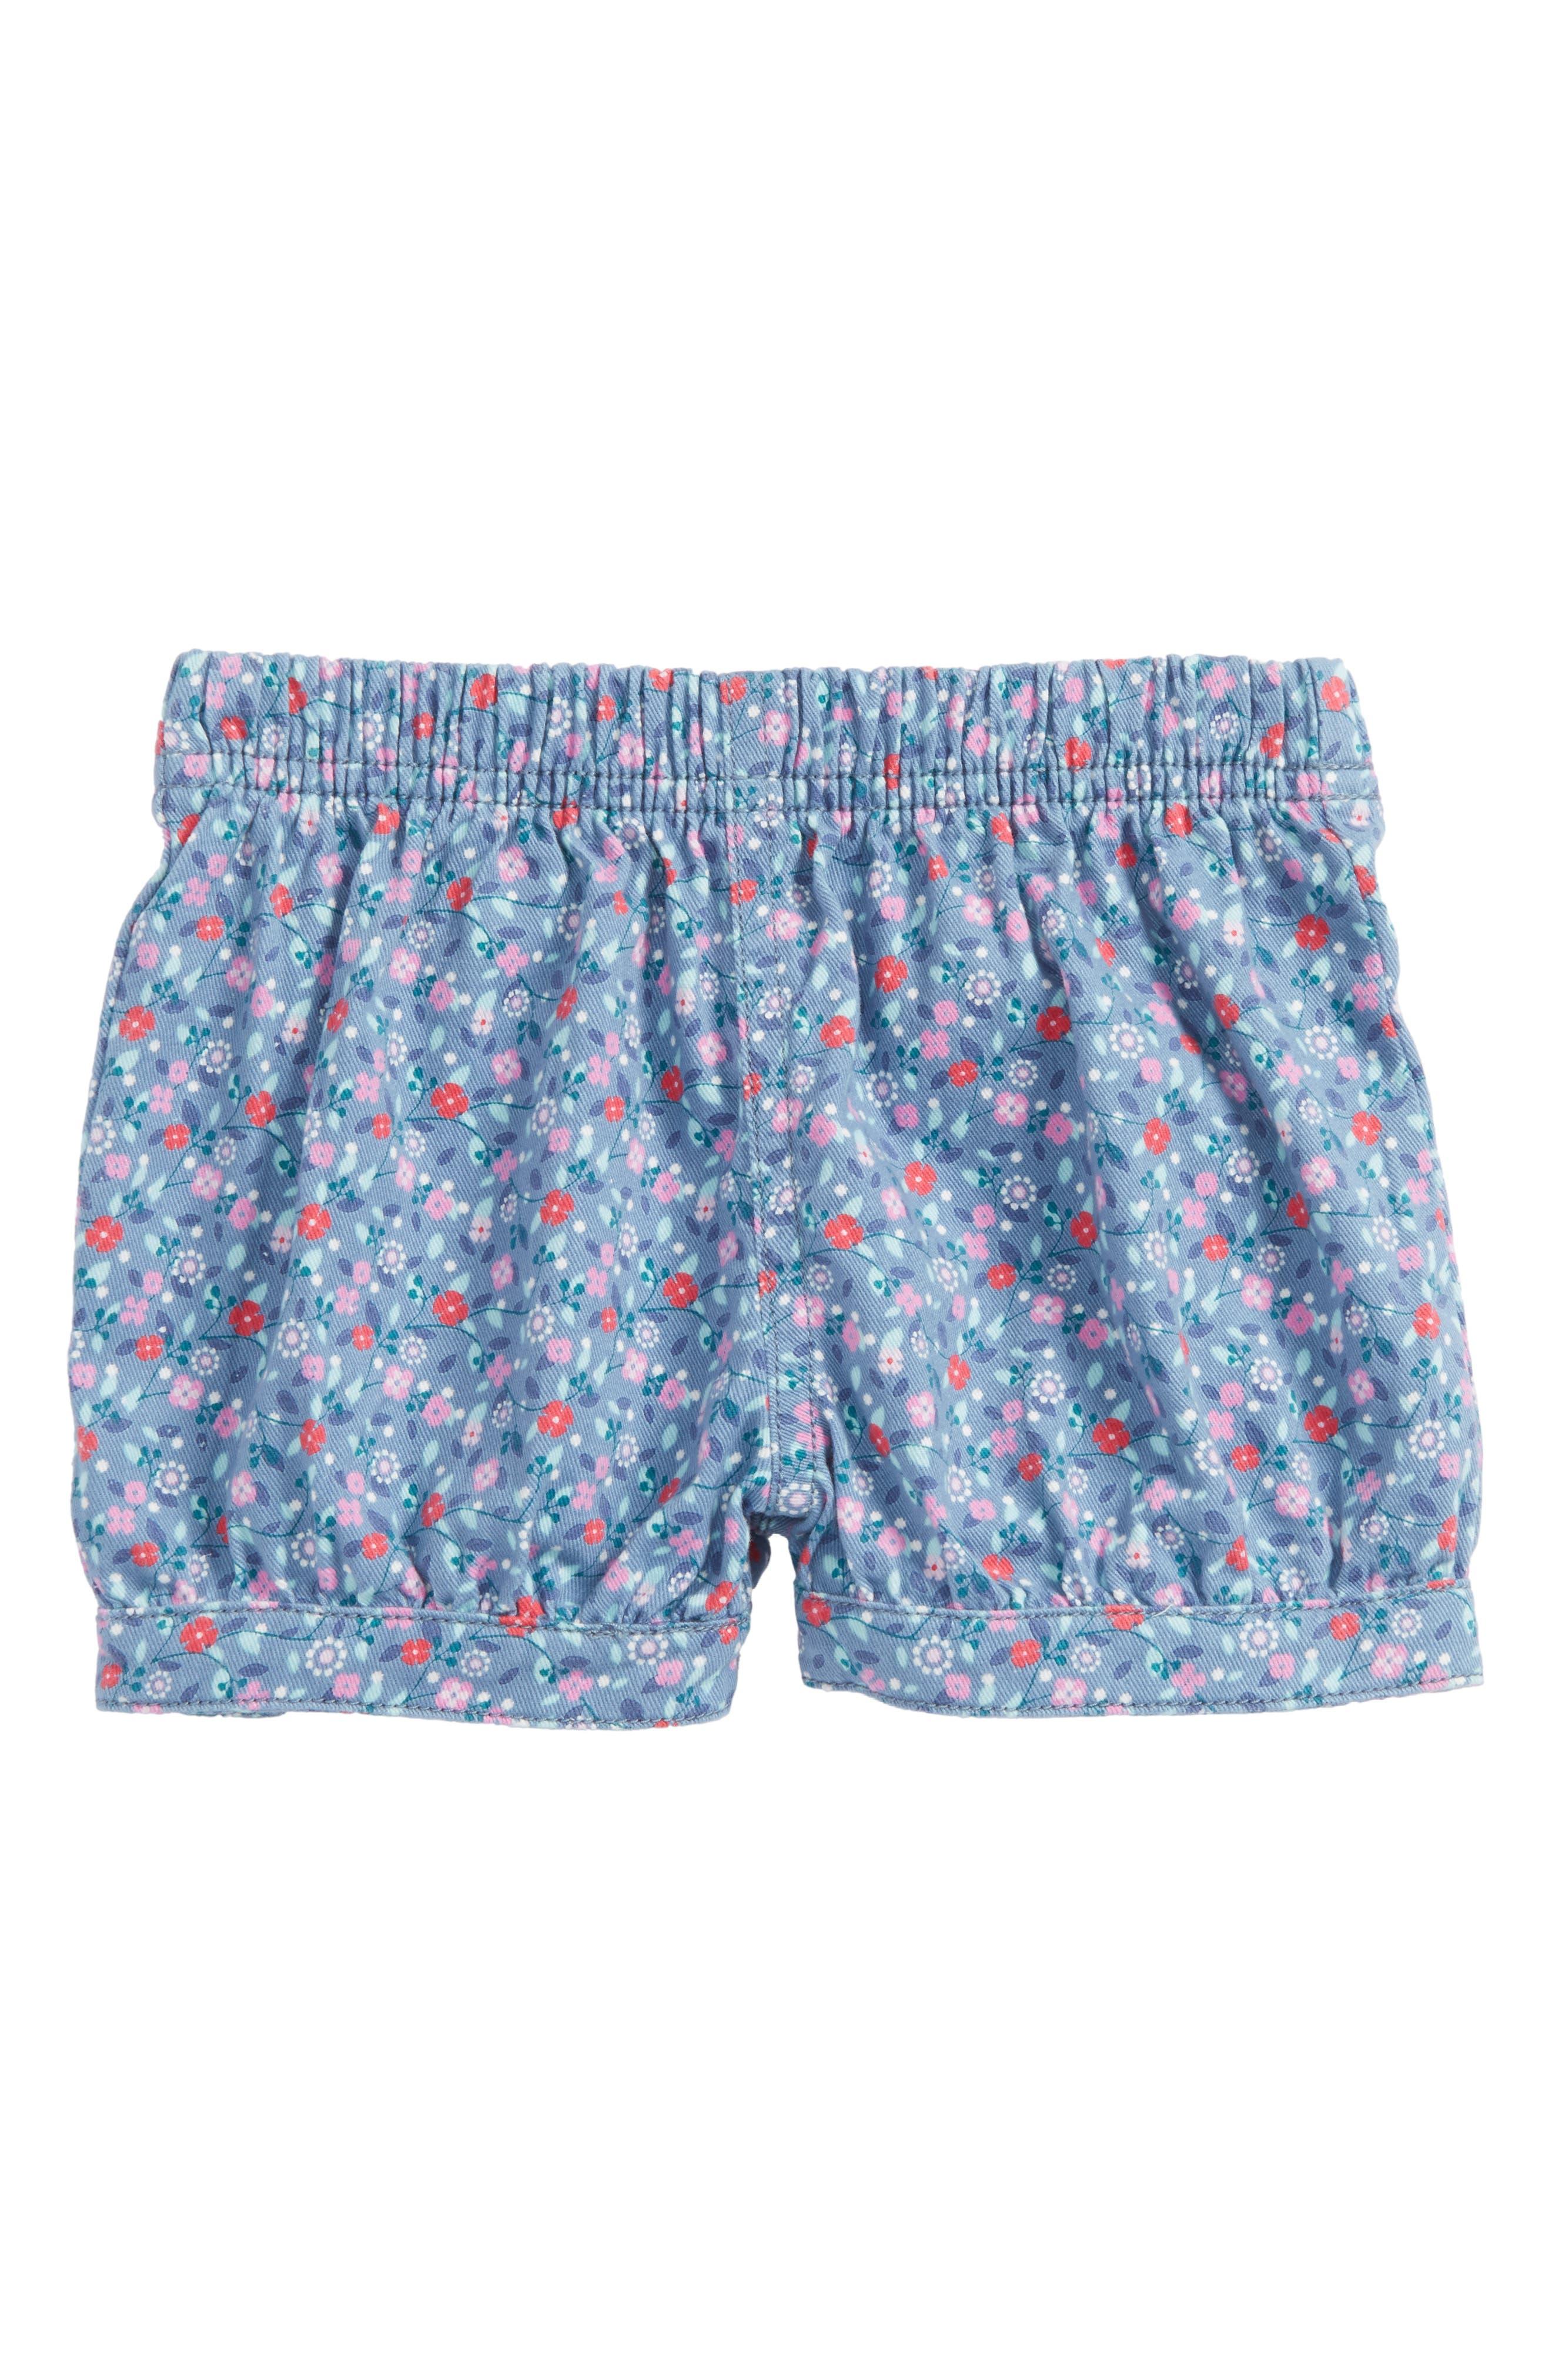 Ditsy Floral Bubble Shorts,                             Main thumbnail 1, color,                             Blue Tide Tiny Florals